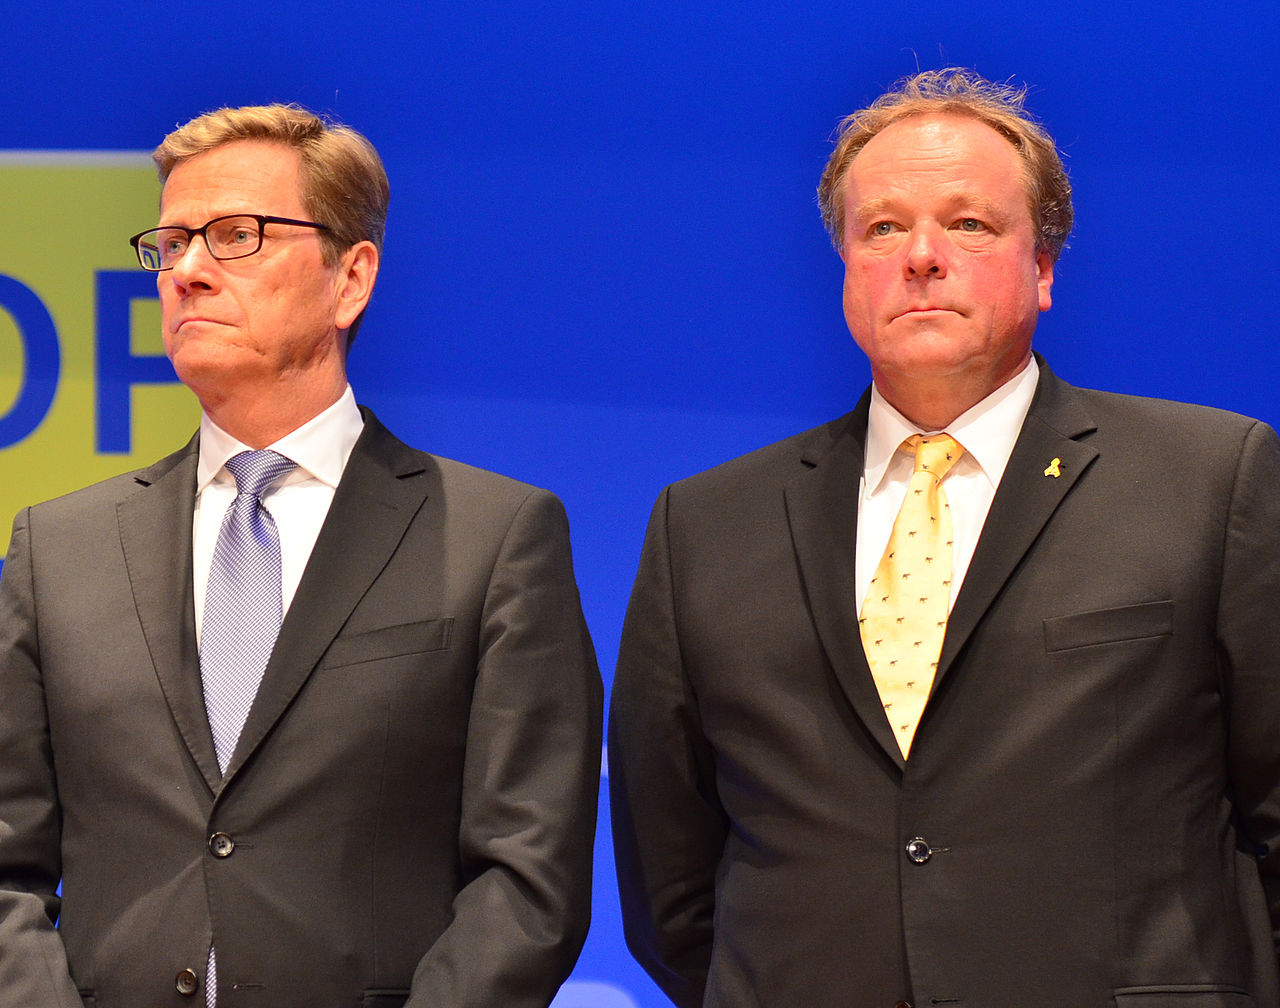 20130922 Bundestagswahl 2013 in Berlin by Moritz Kosinsky0295.jpg